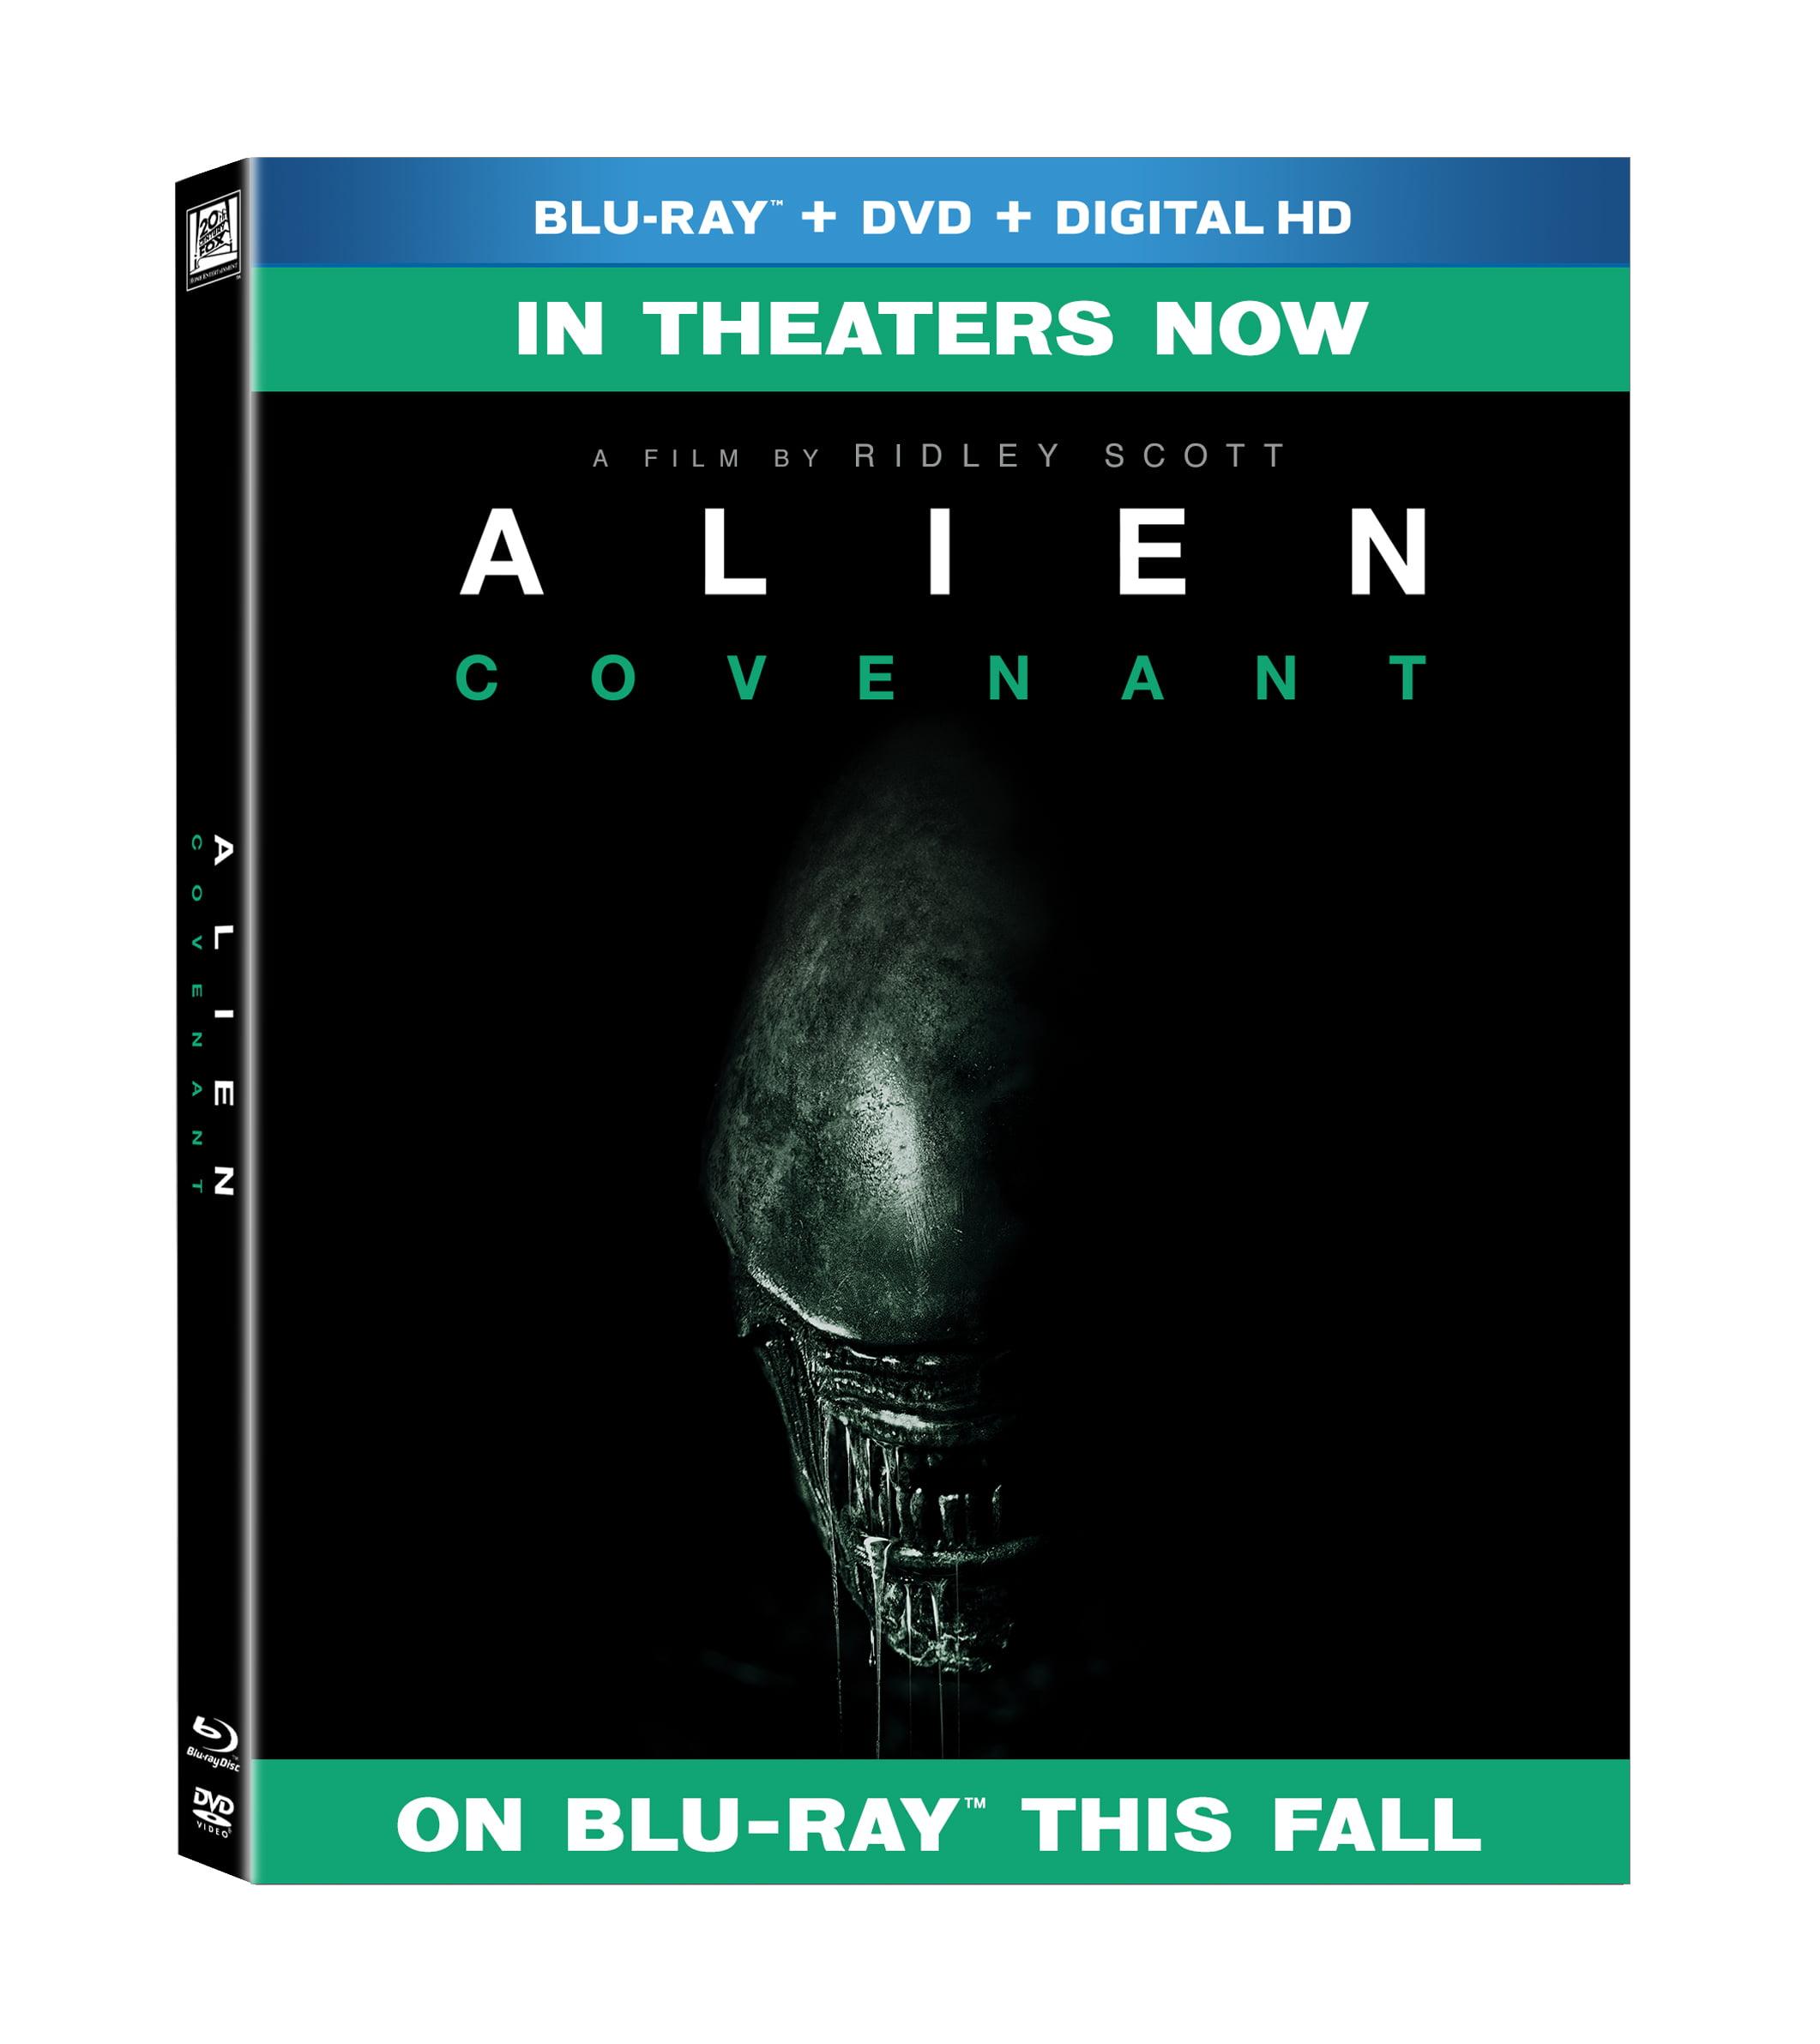 Alien: Covenant (Blu-ray + DVD + Digital HD) by Twentieth Century Fox